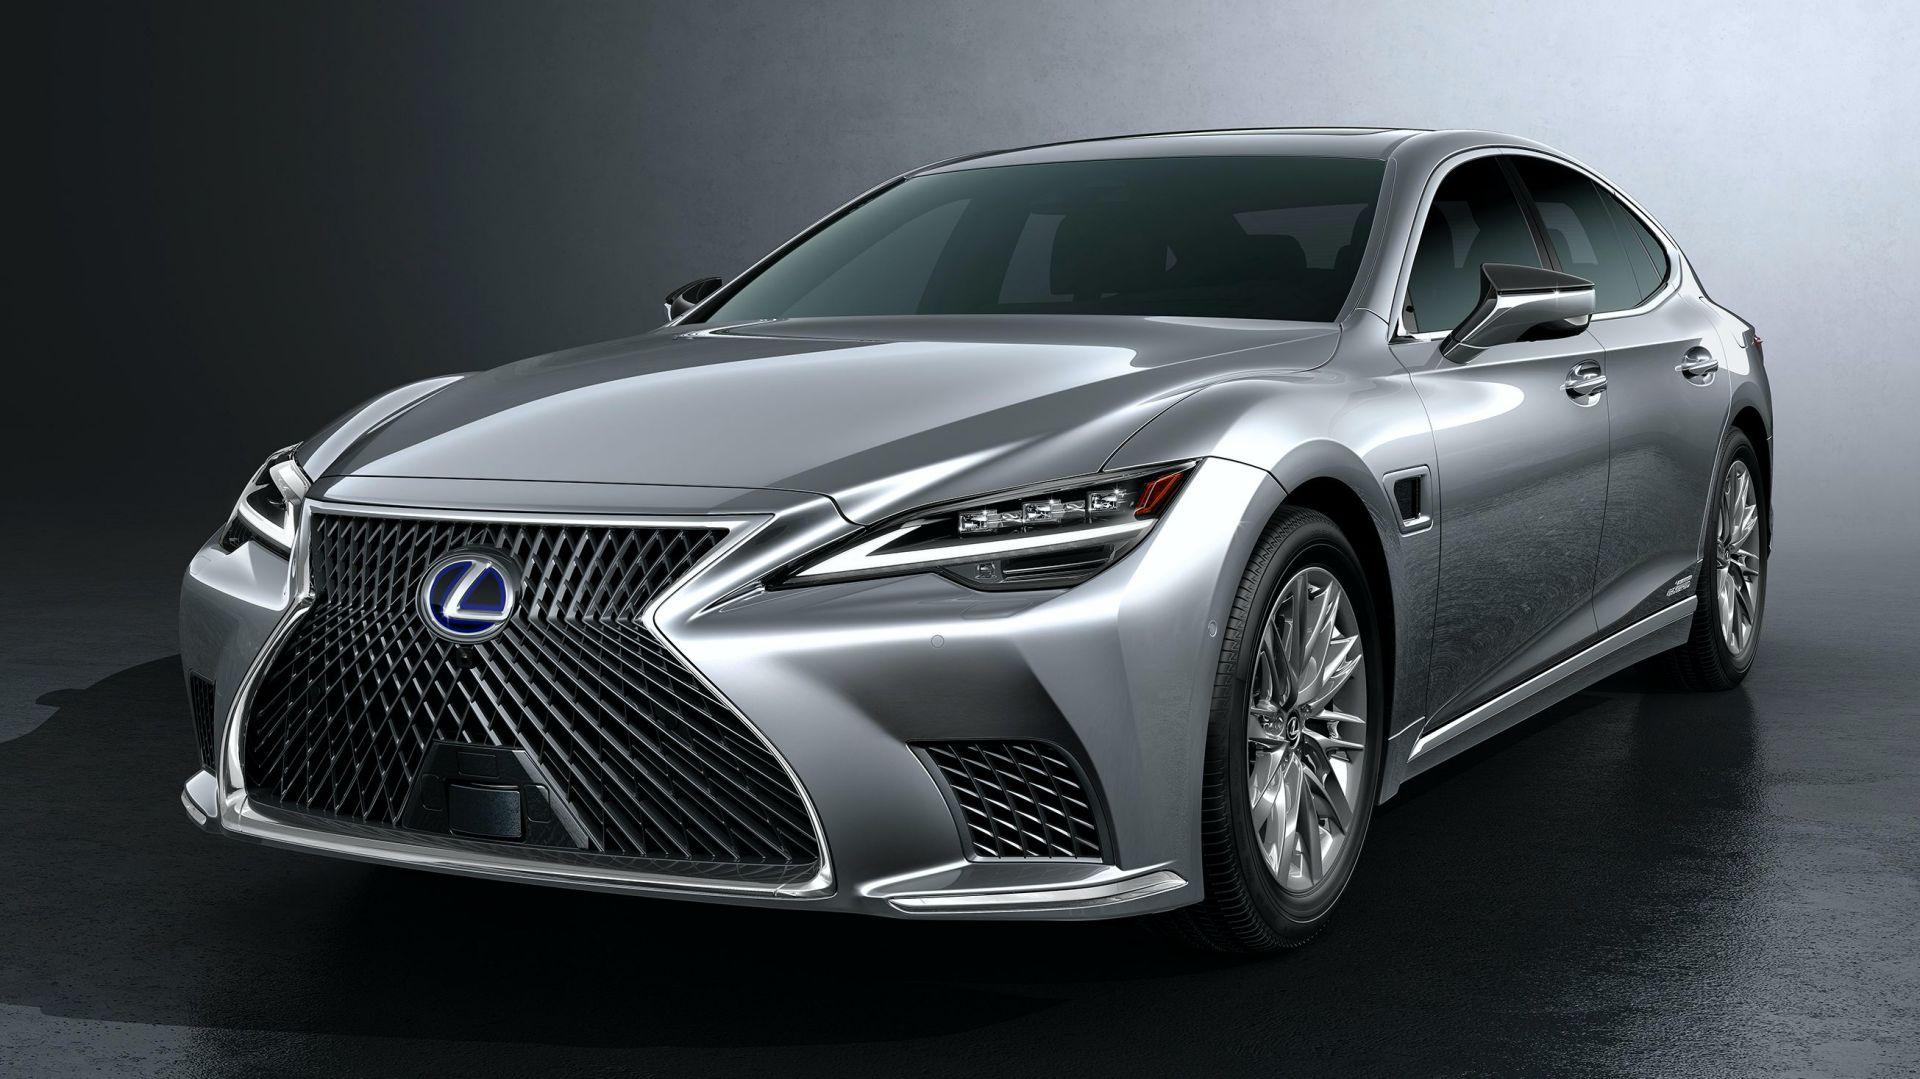 2021-lexus-ls-facelift-7.jpg